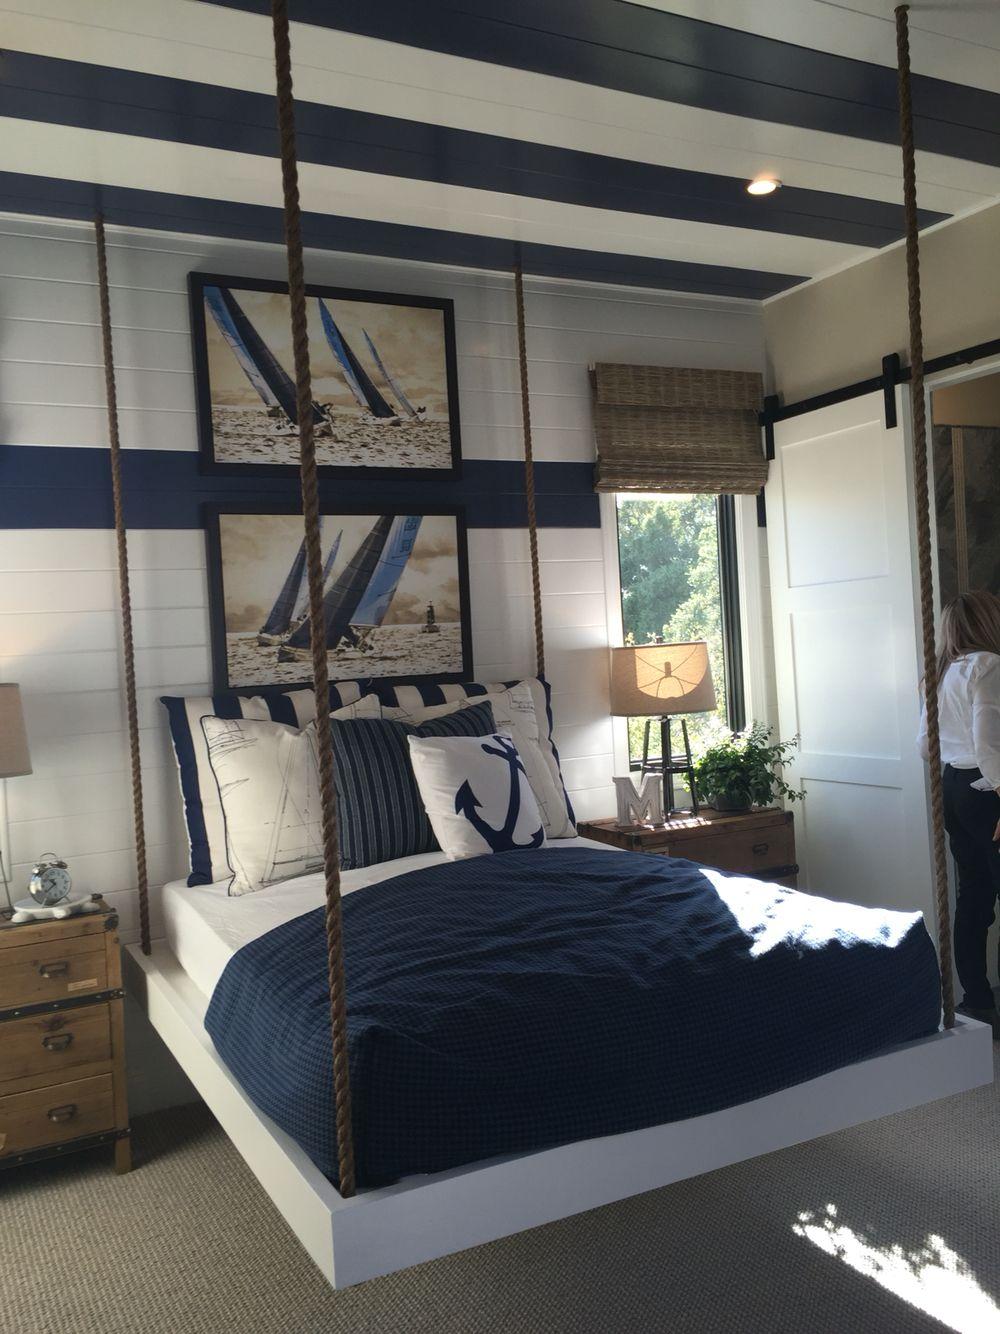 Nautical Room Coastal Bedroom Decorating Nautical Decor Bedroom